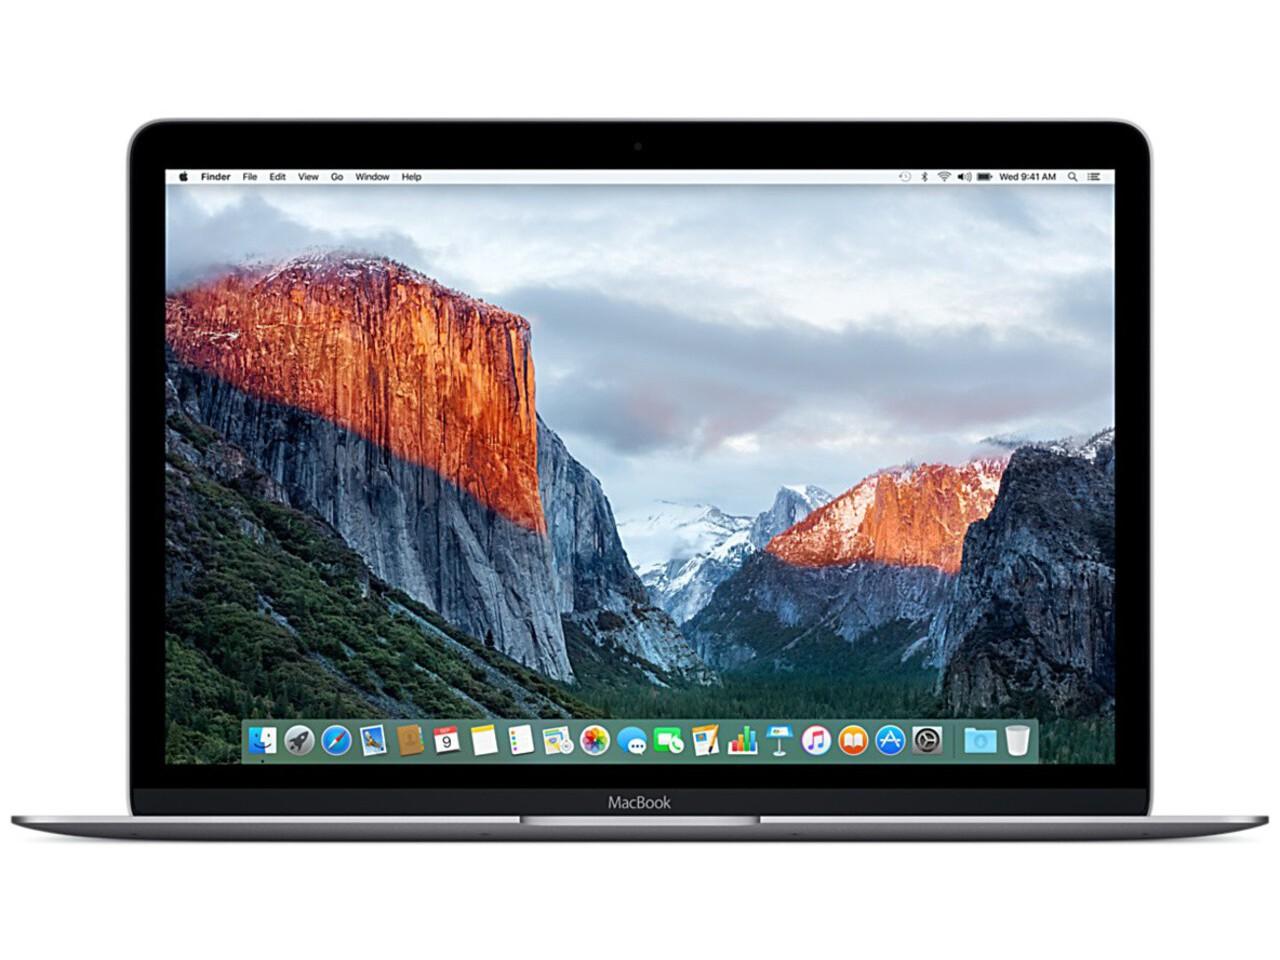 macbook 12 inch 2016 space gray